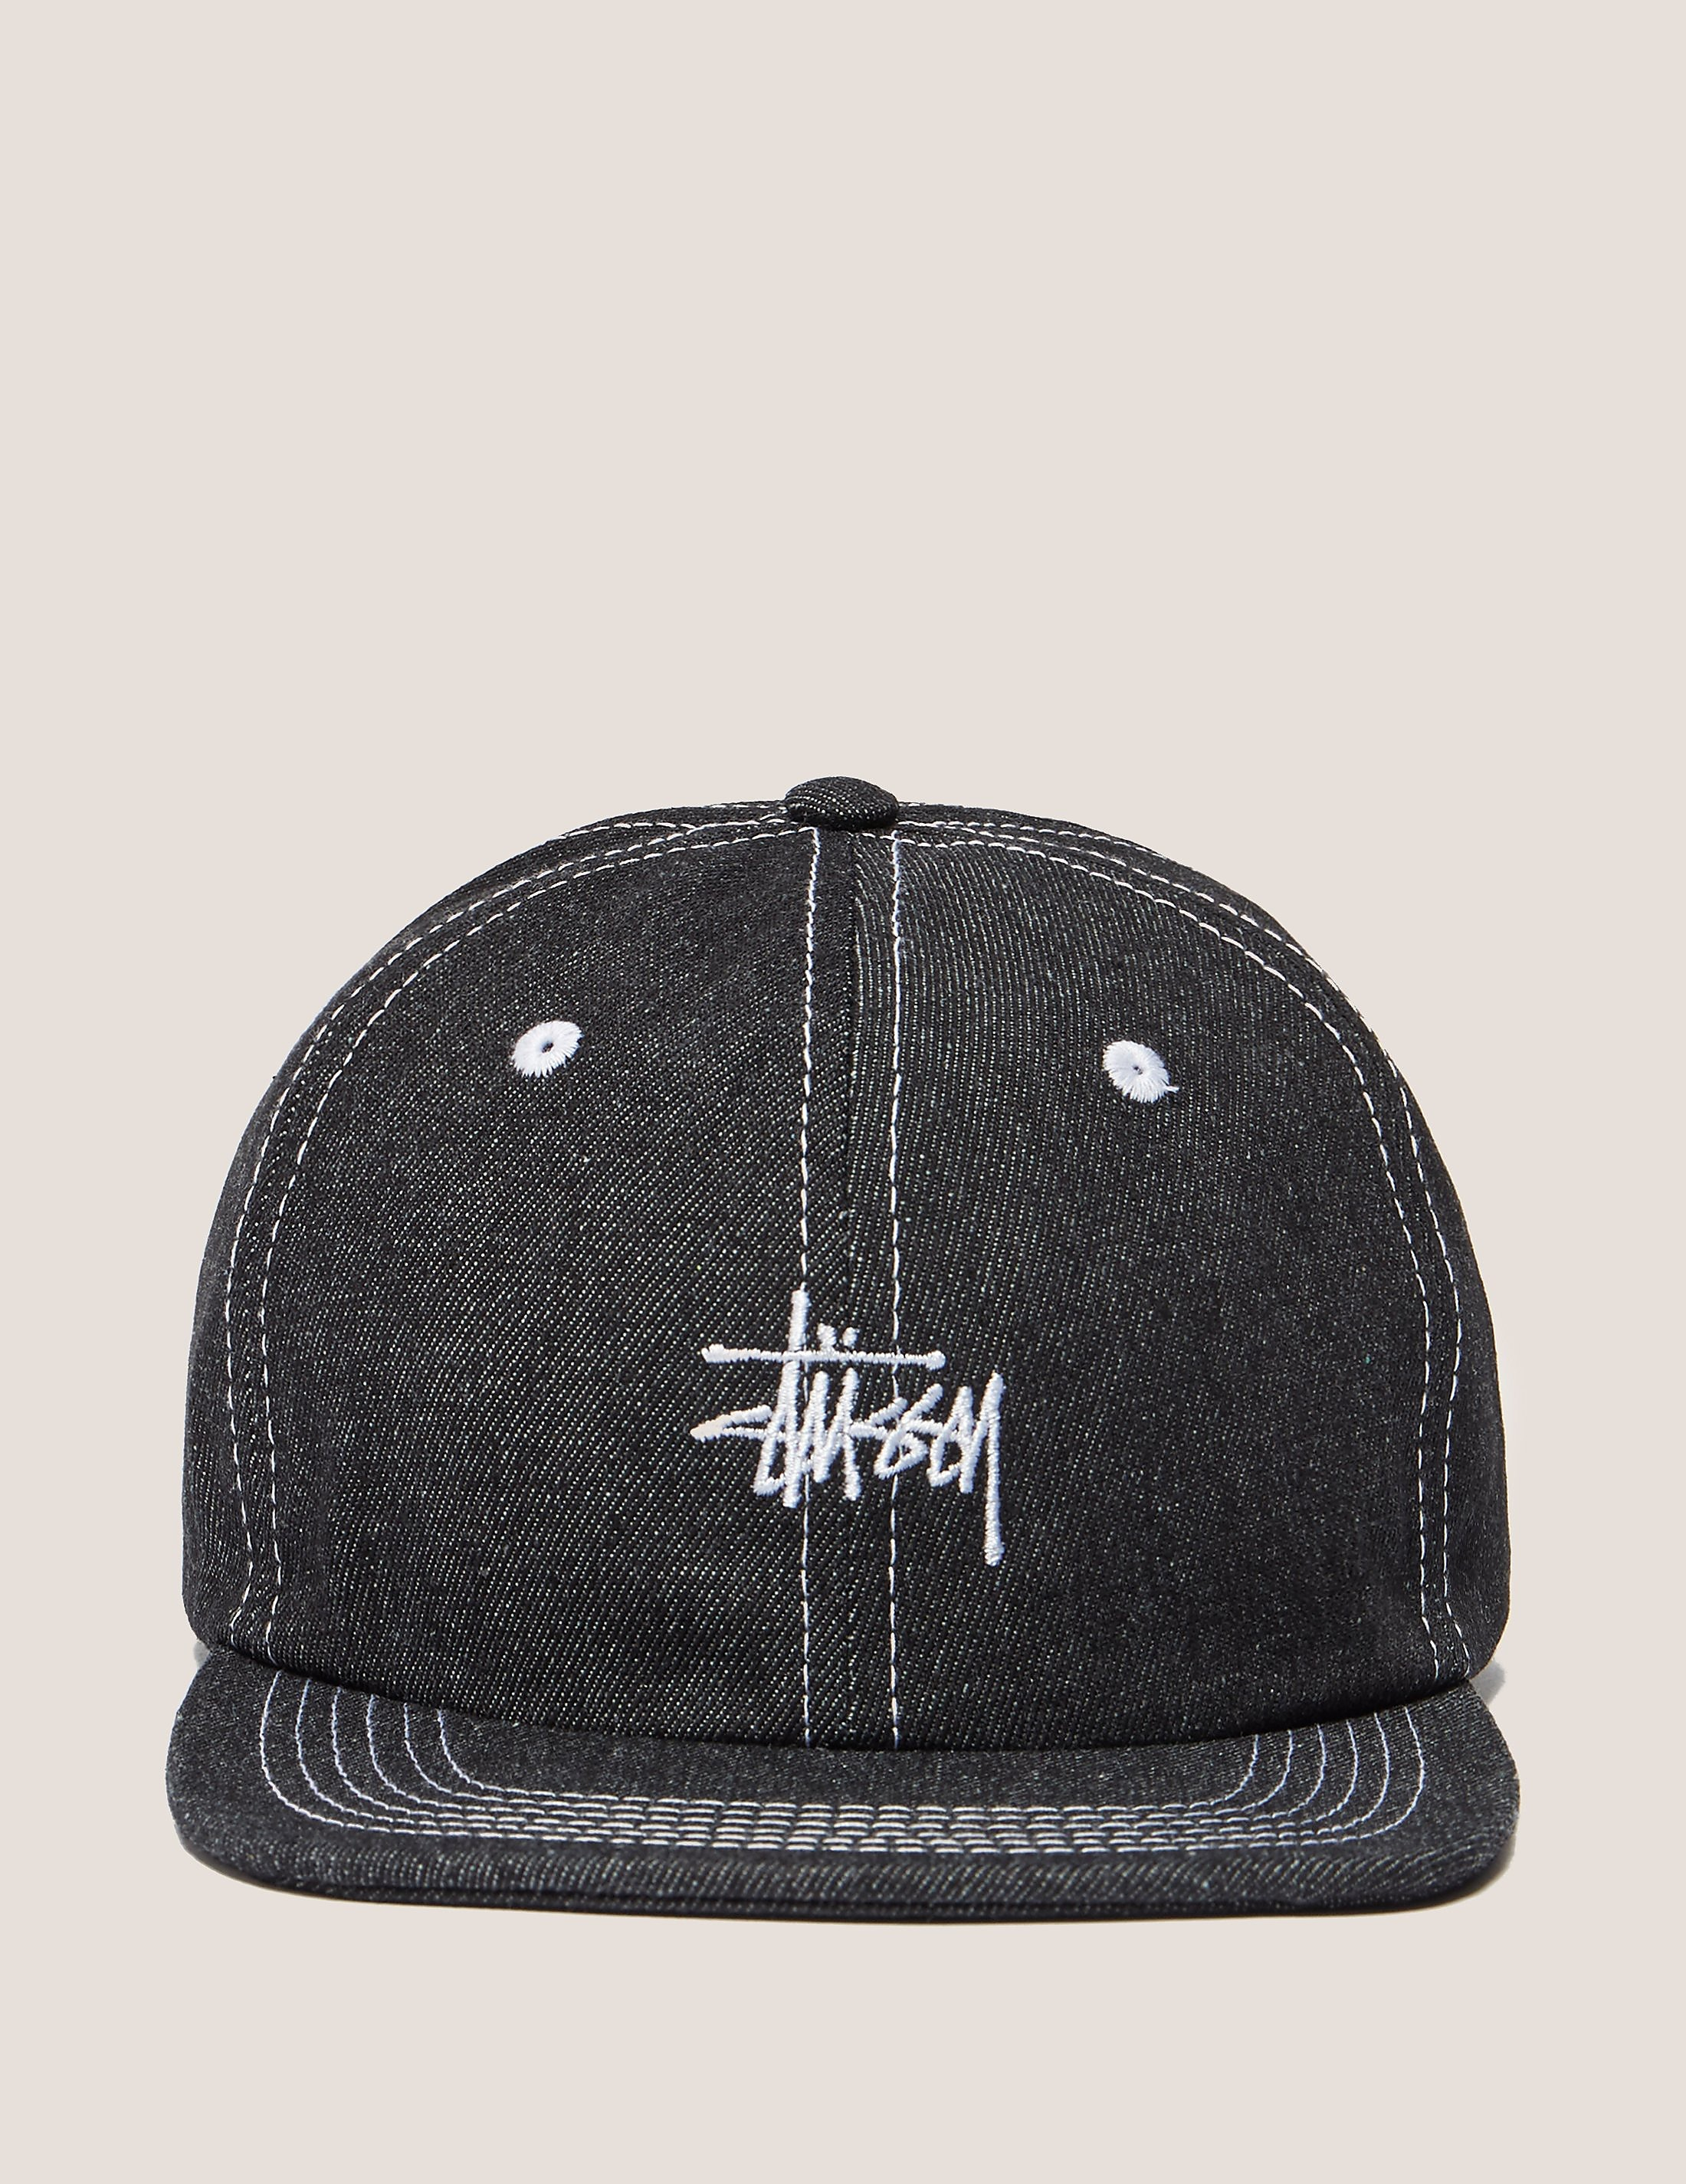 Stussy Stitch Denim Cap